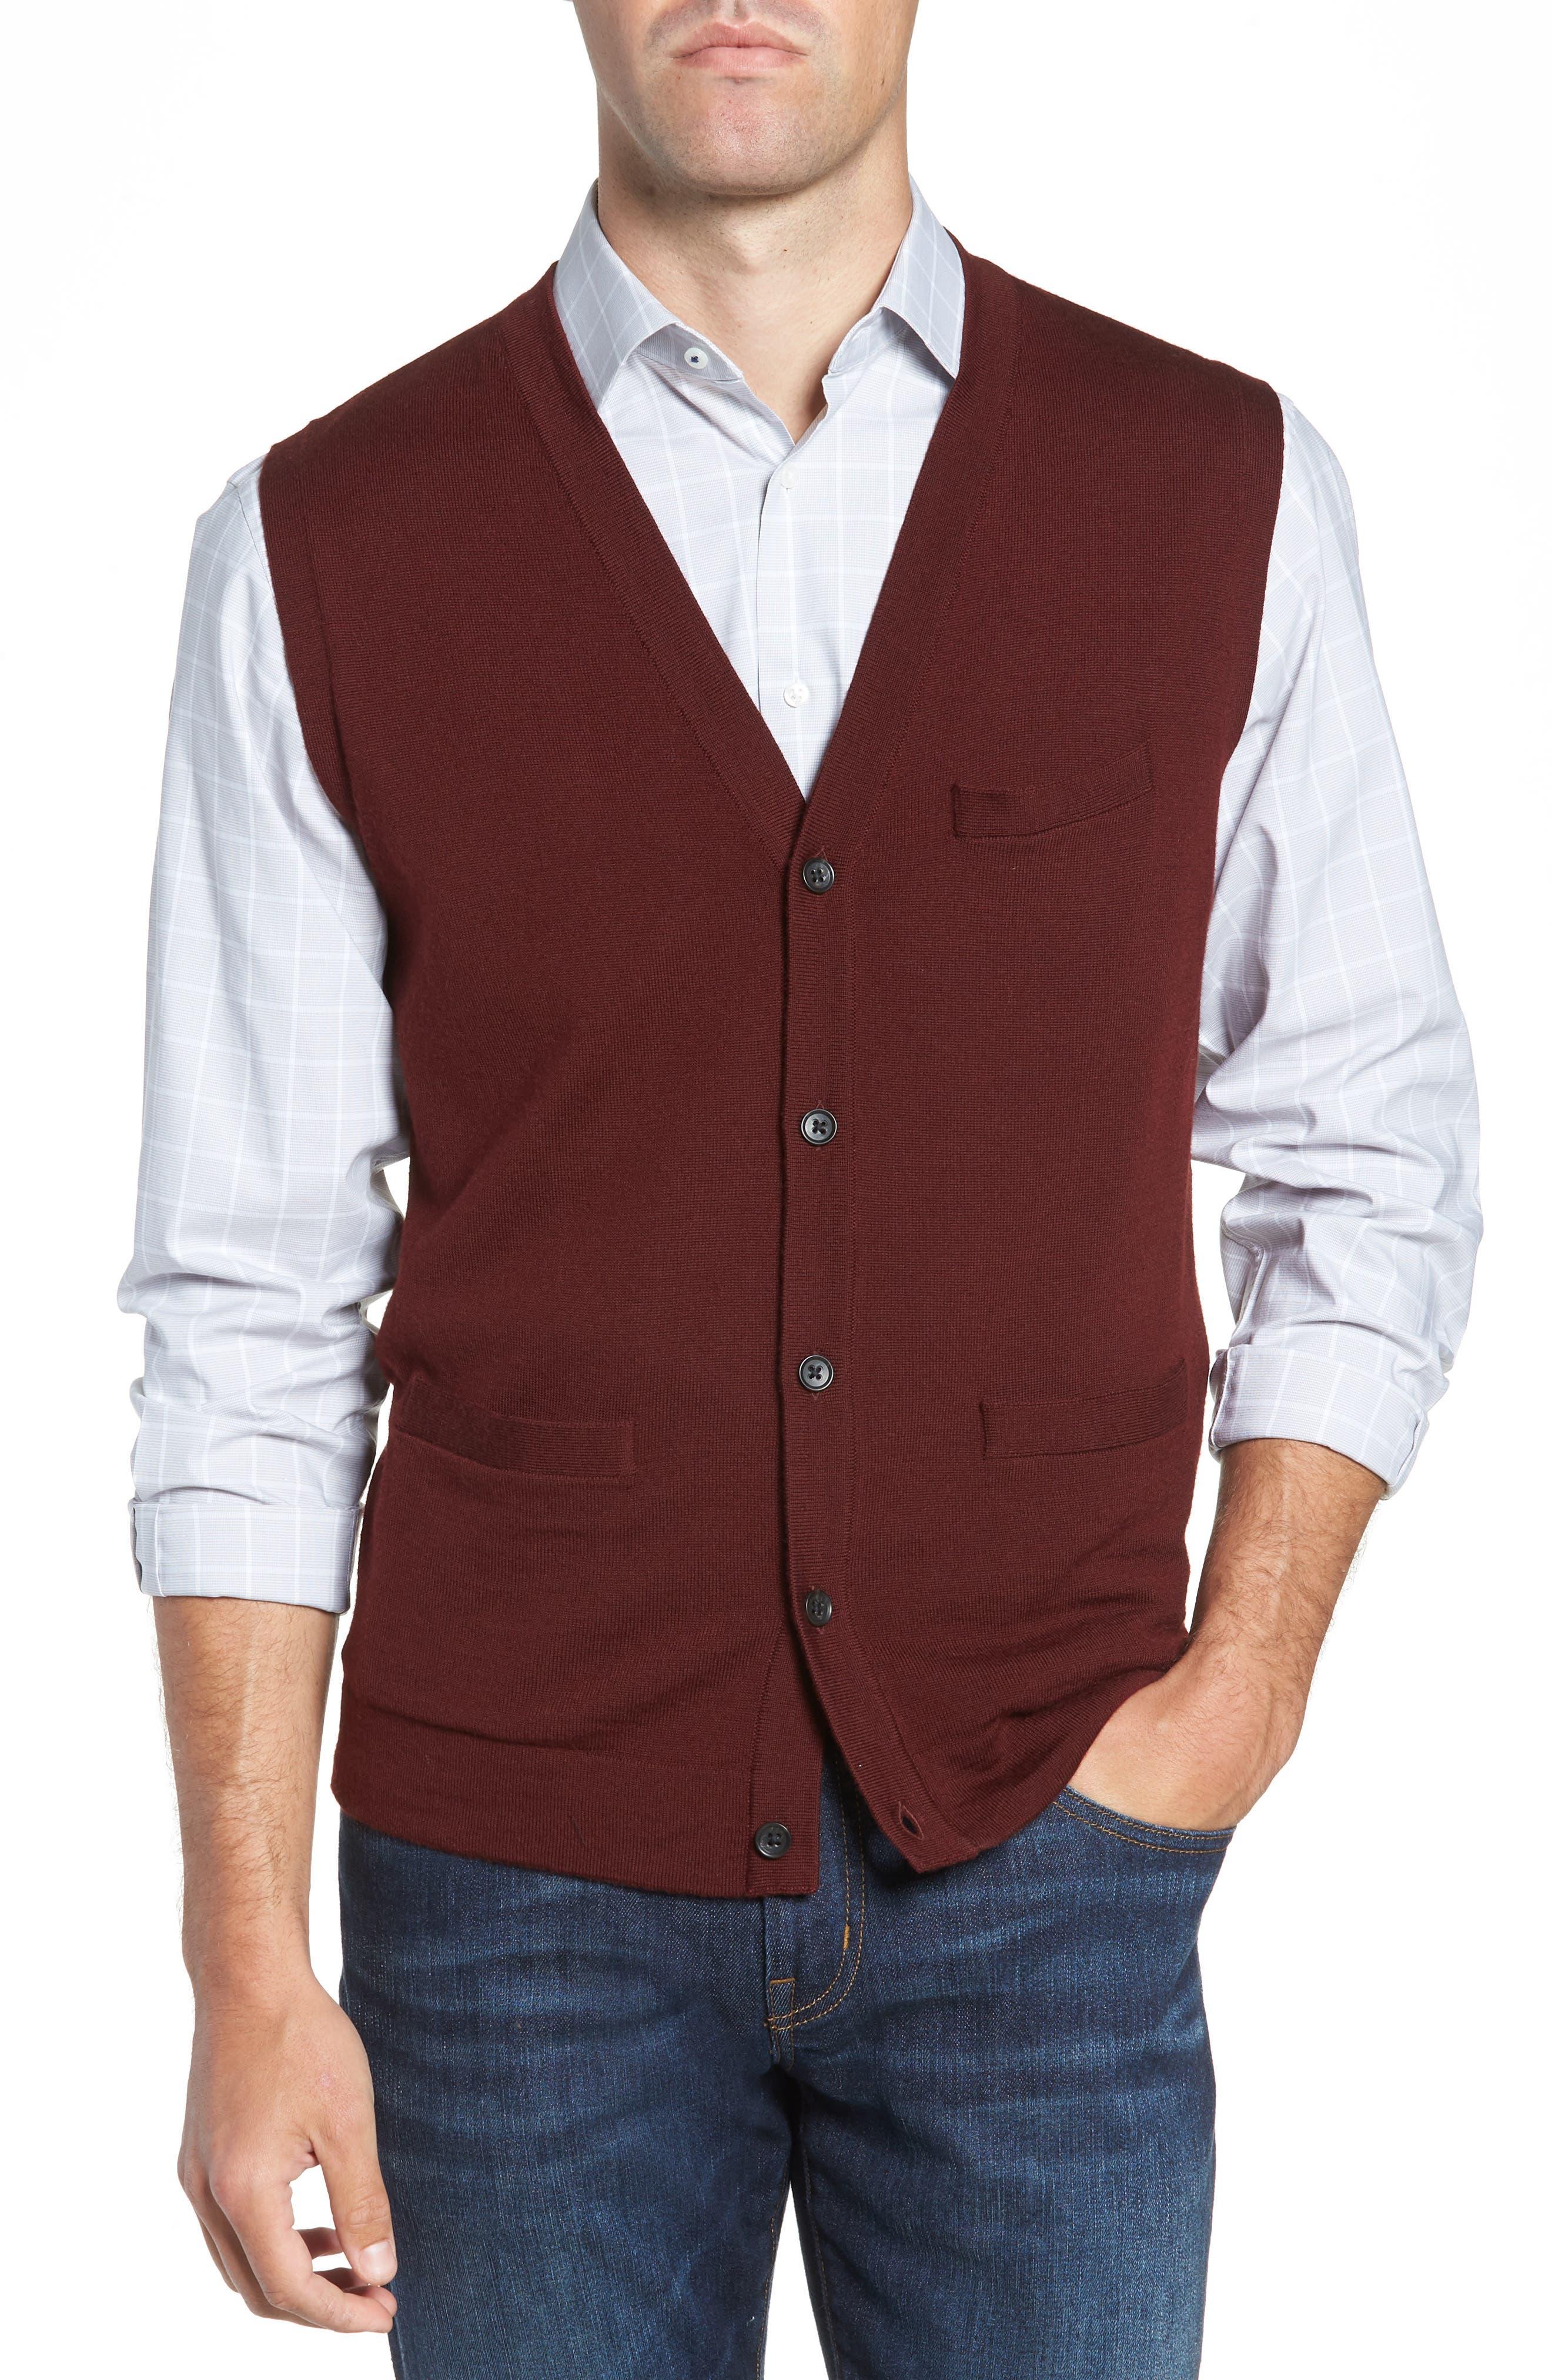 Nordstrom Shop Merino Button Front Sweater Vest, Burgundy